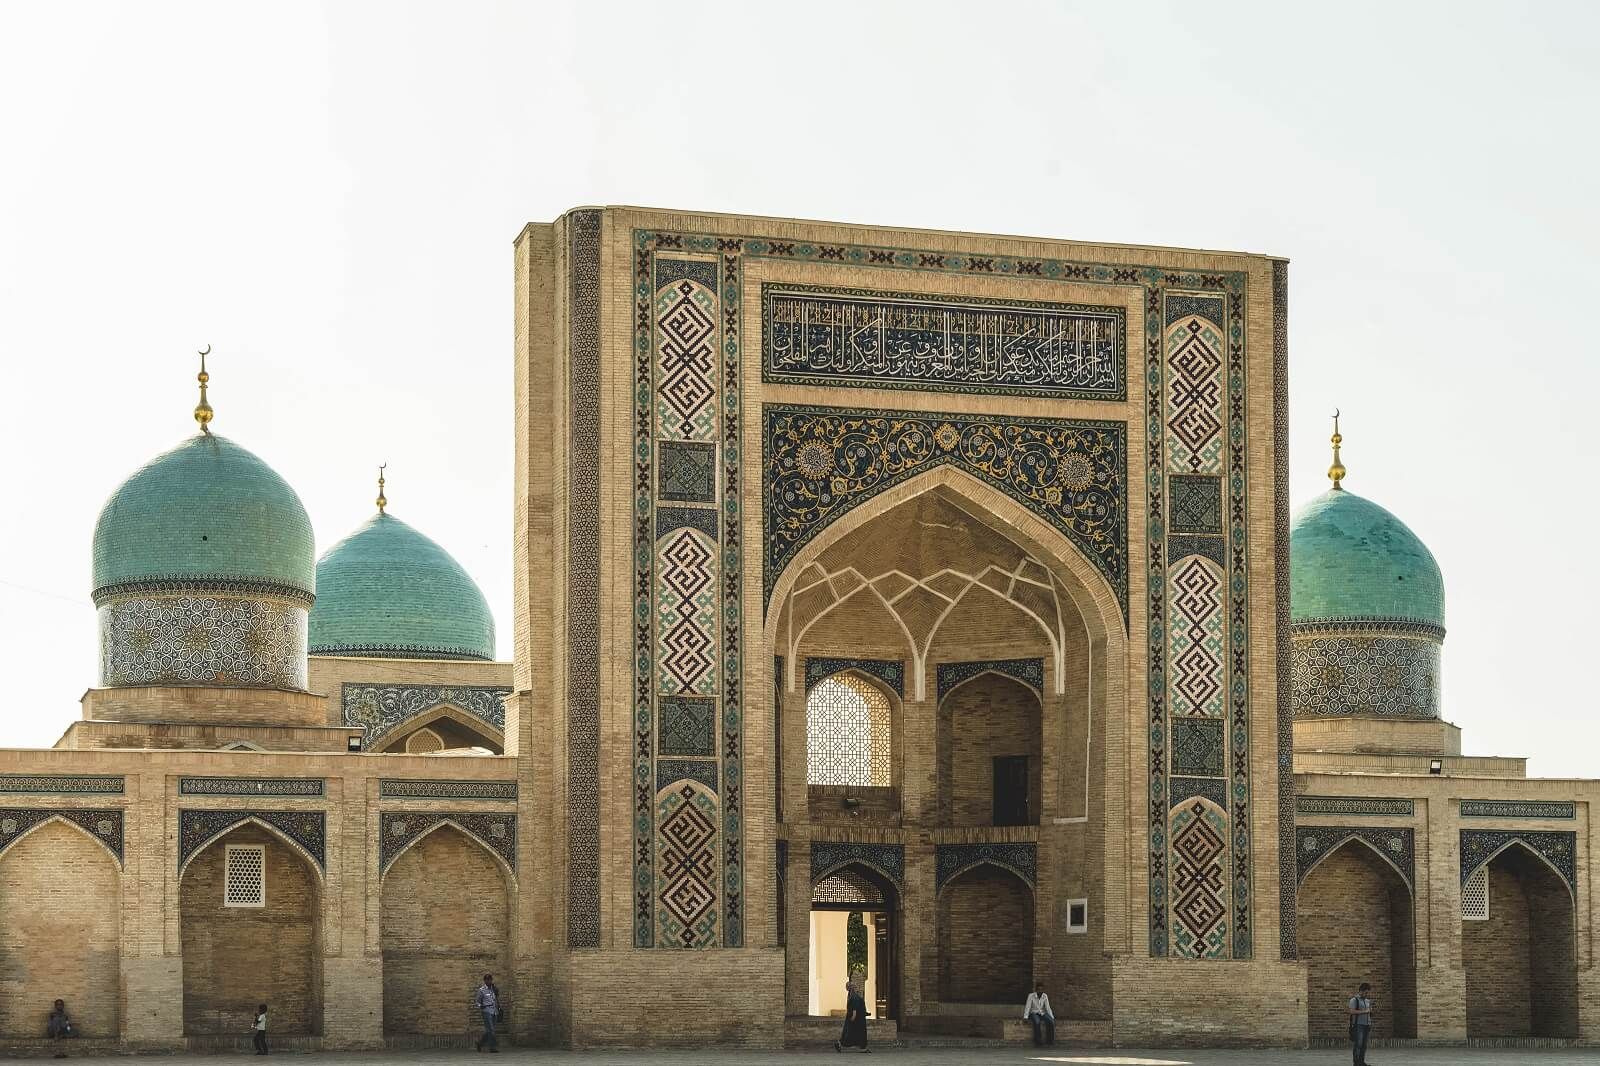 Khujand – Tashkent (180km, 4h)